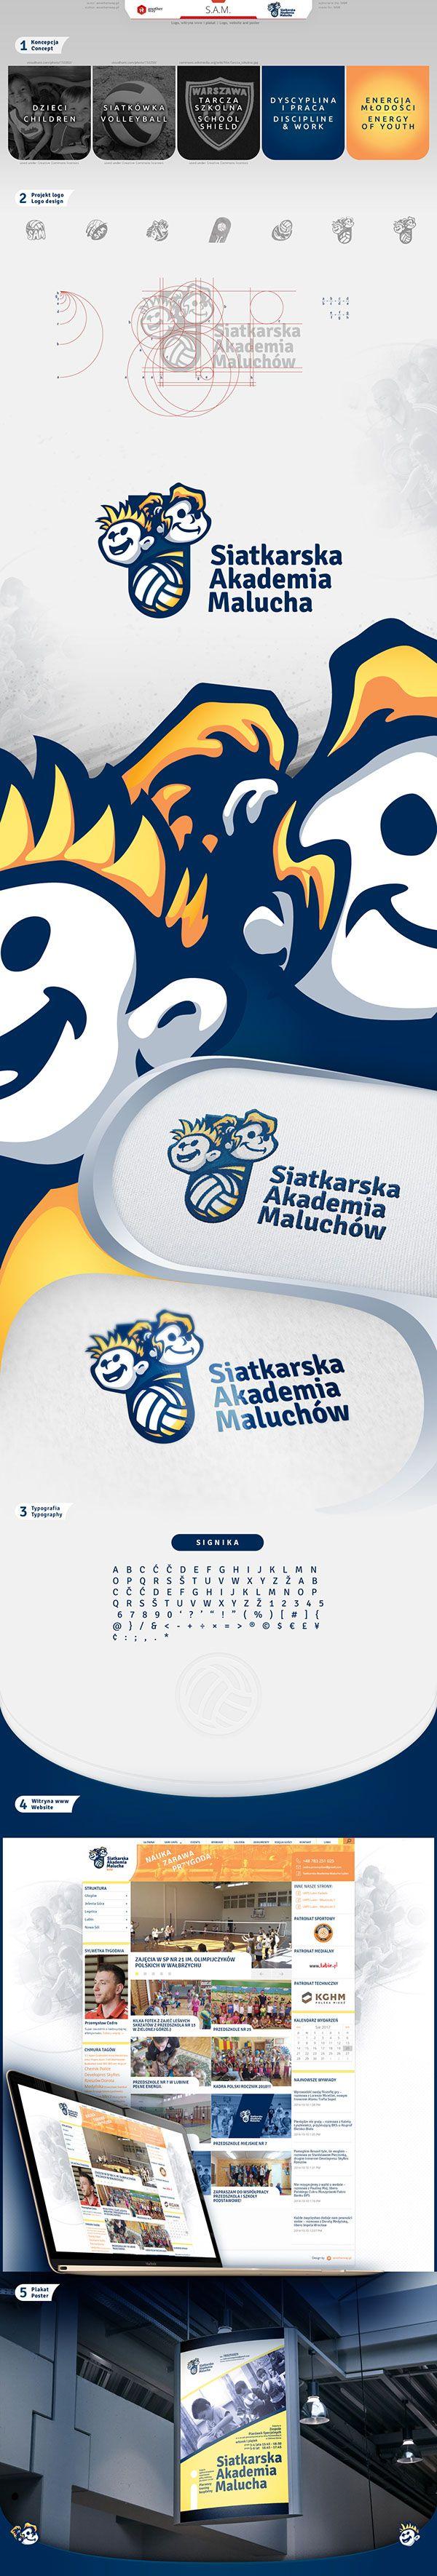 "Logo, website and poster design for private volleyball school, for pre-school, elementary and junior high school children, called ""Volleyball Children Academy"" (in polish: ""Siatkarska Akademia Maluchów""- short: ""SAM""). #siatkówka, #szkoła, #zabawa, #nauka, #dzieci, #logo, #plakat, #strona www"